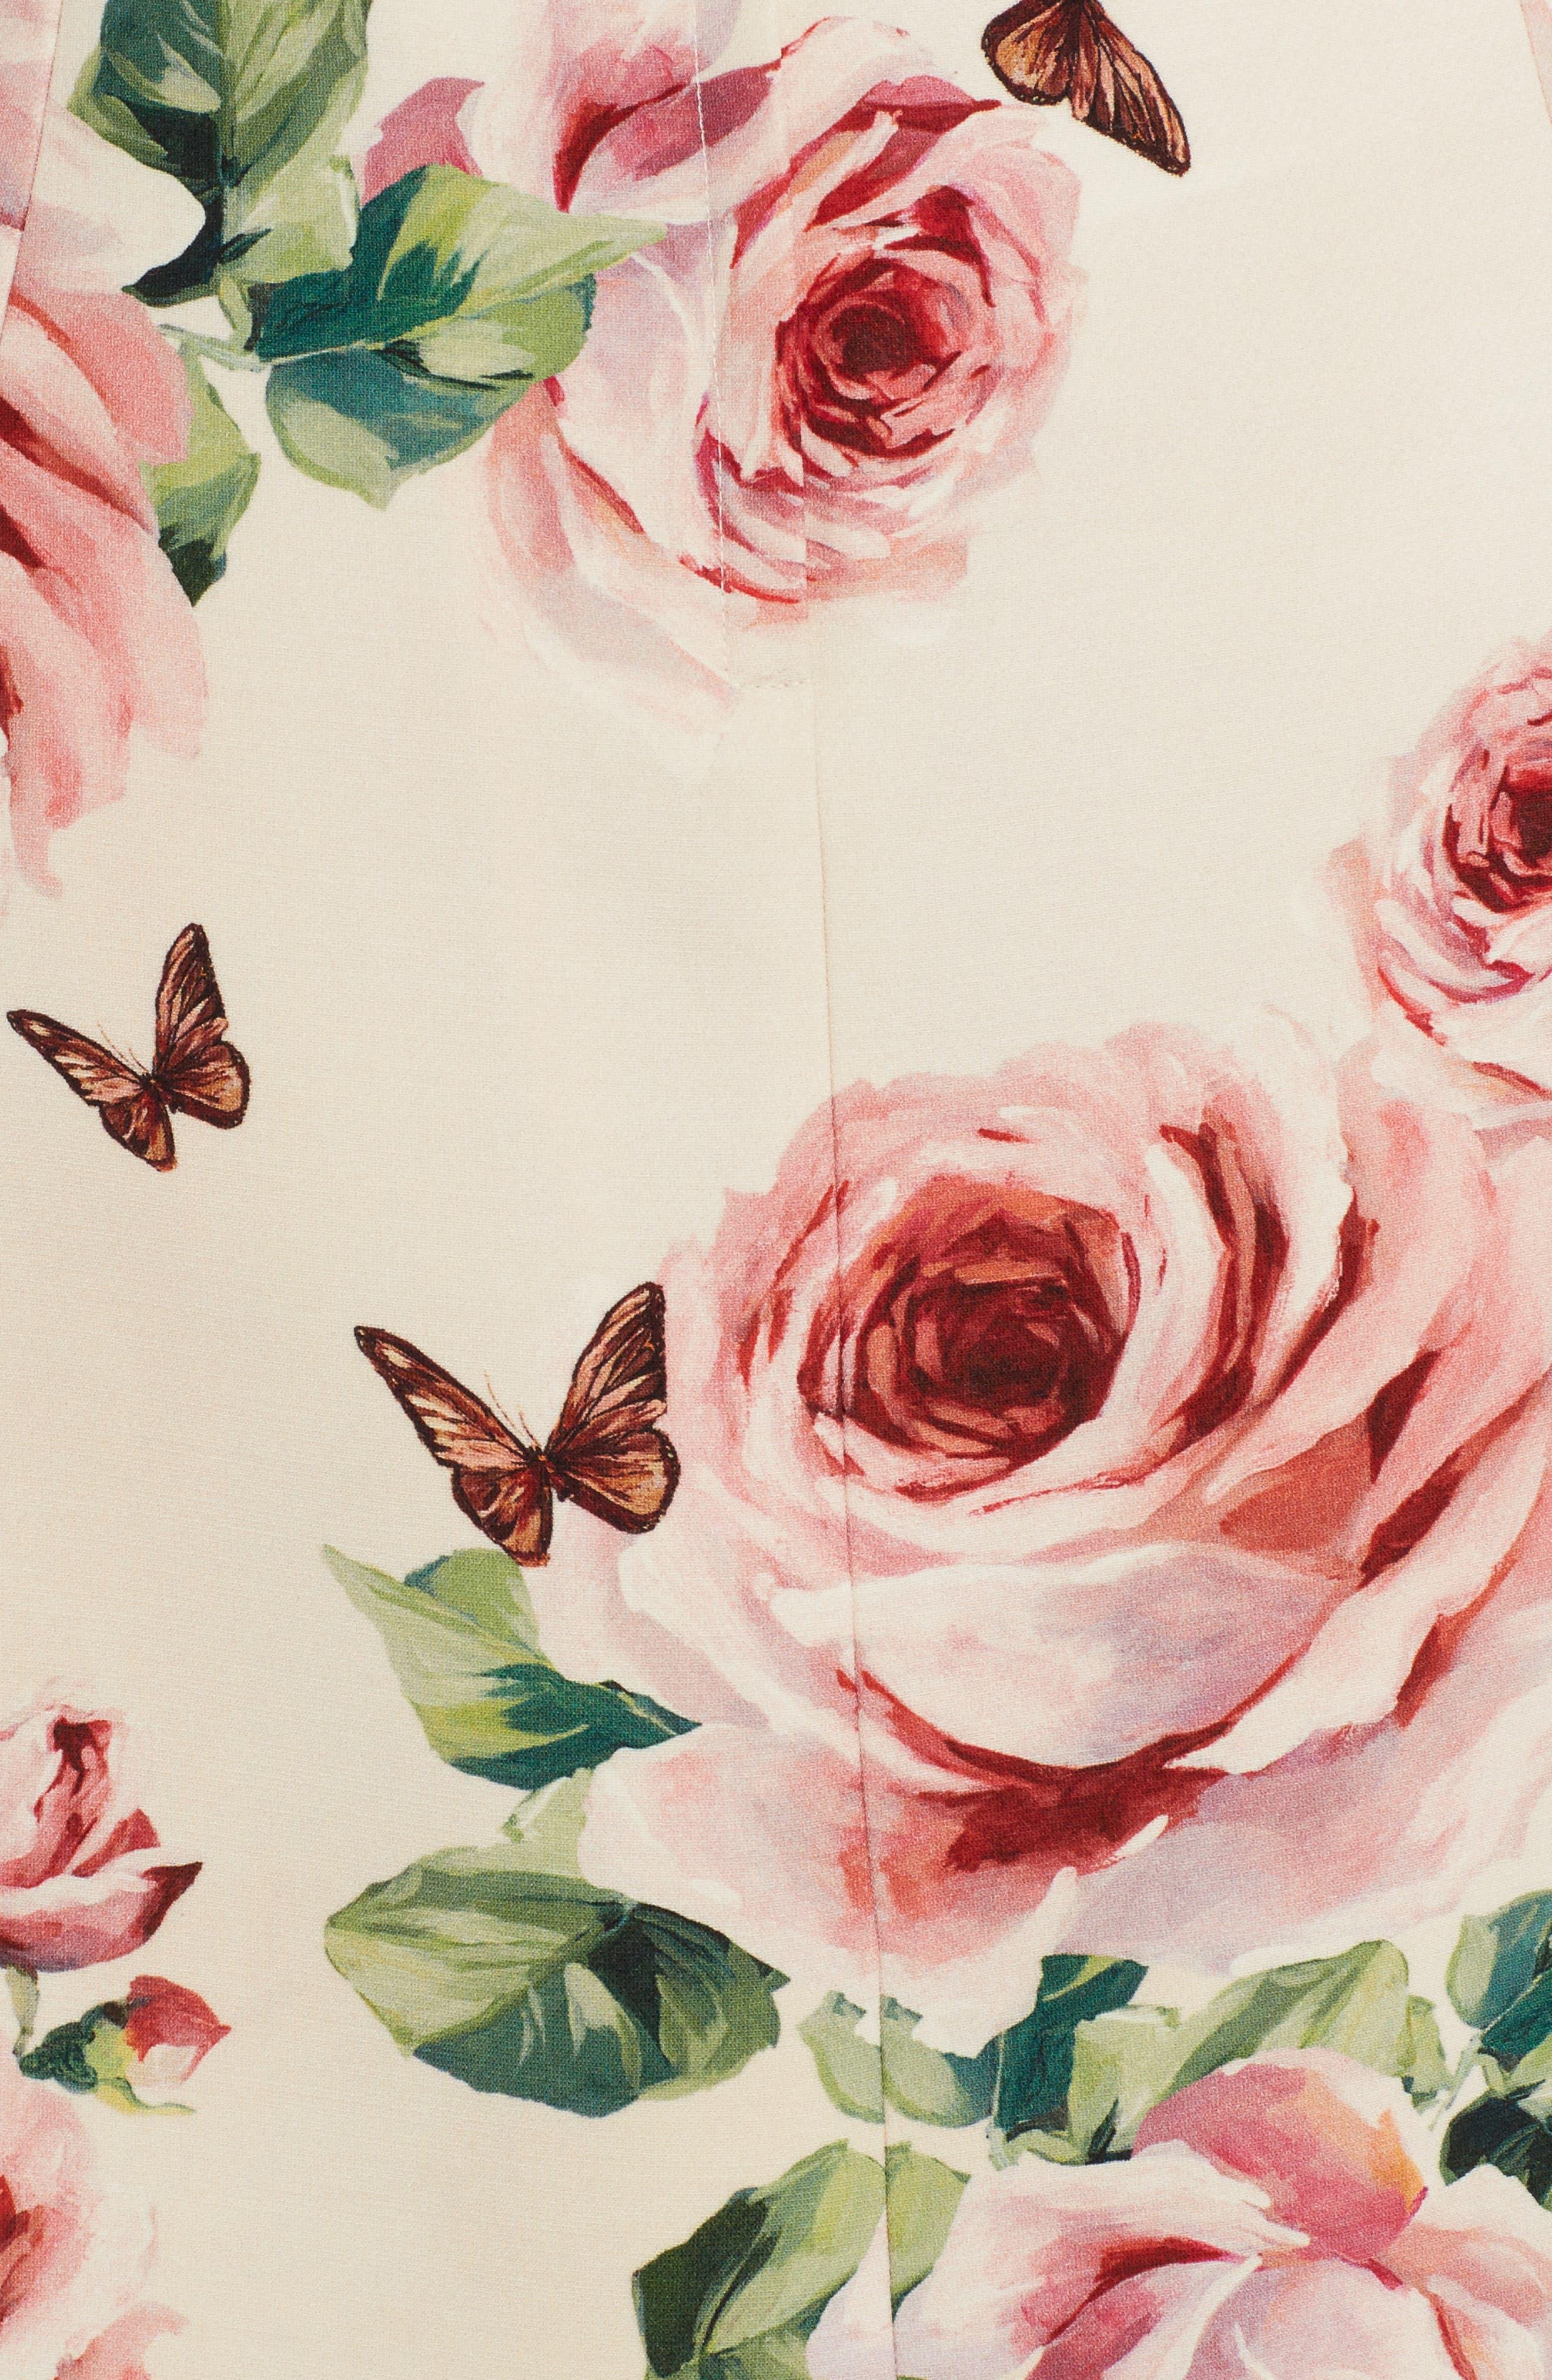 Rose Print Wool & Silk Shift Dress,                             Alternate thumbnail 5, color,                             Pink